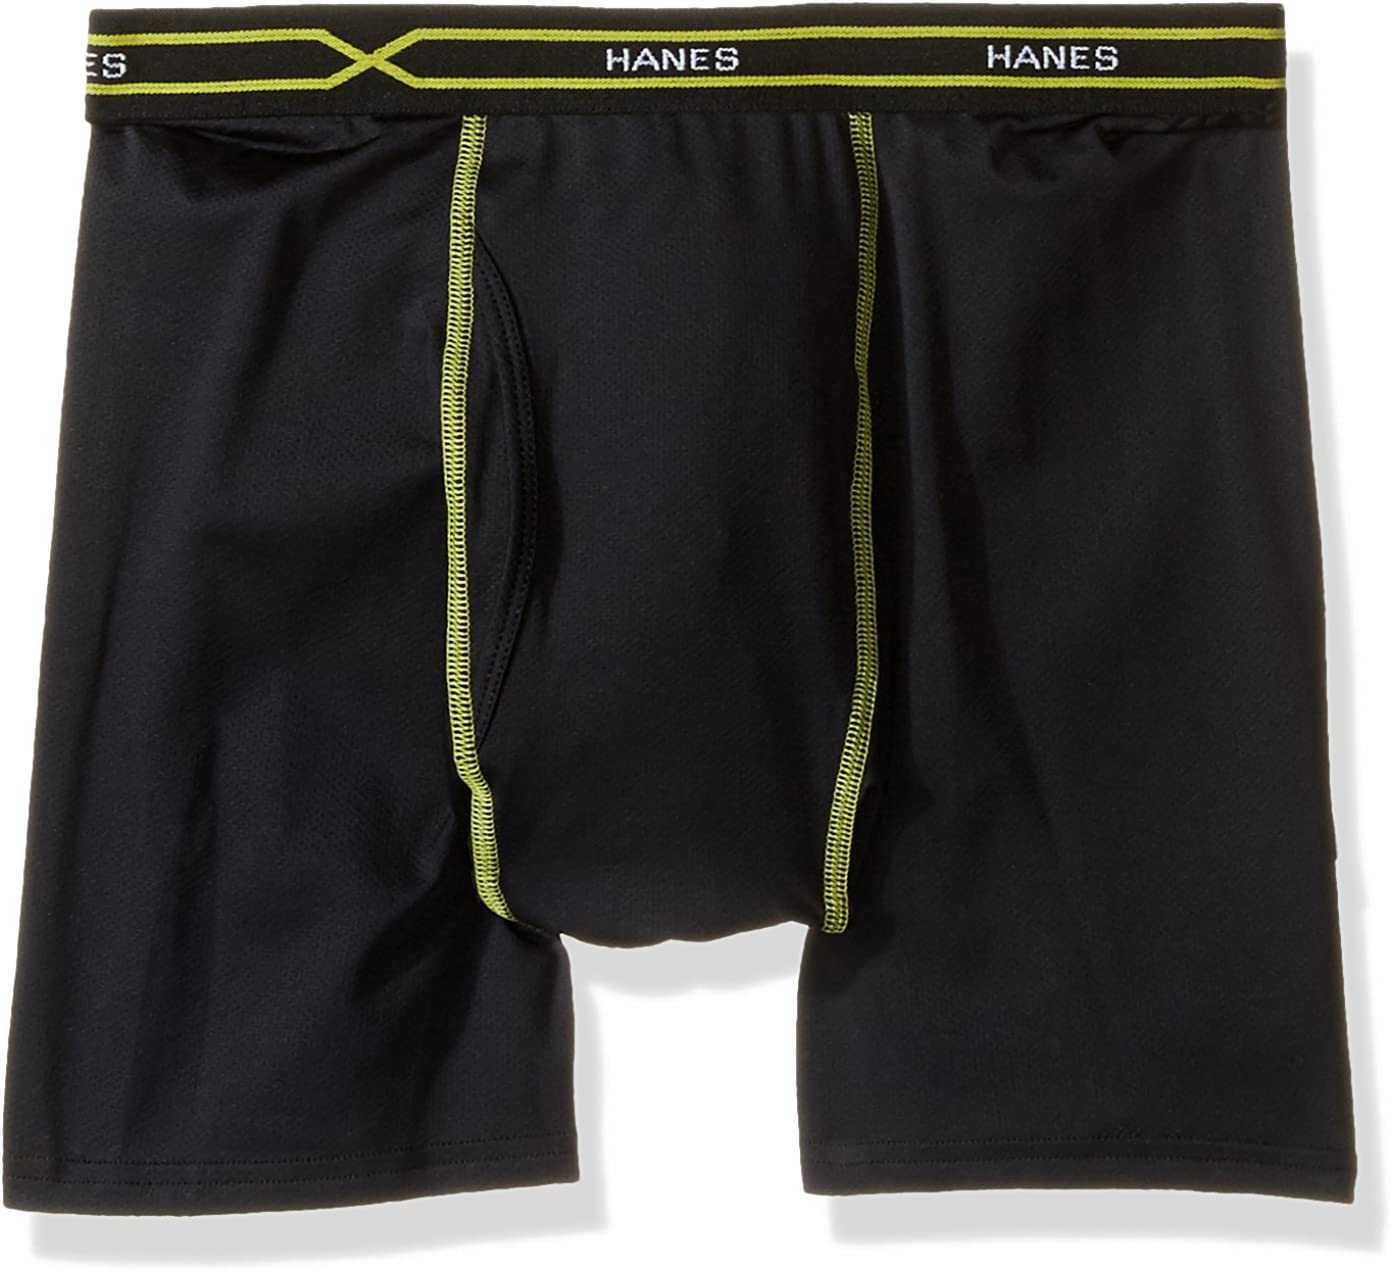 Hanes Men's FreshIQ X-Temp All Mesh Boxer with ComfortFlex Waistband Brief